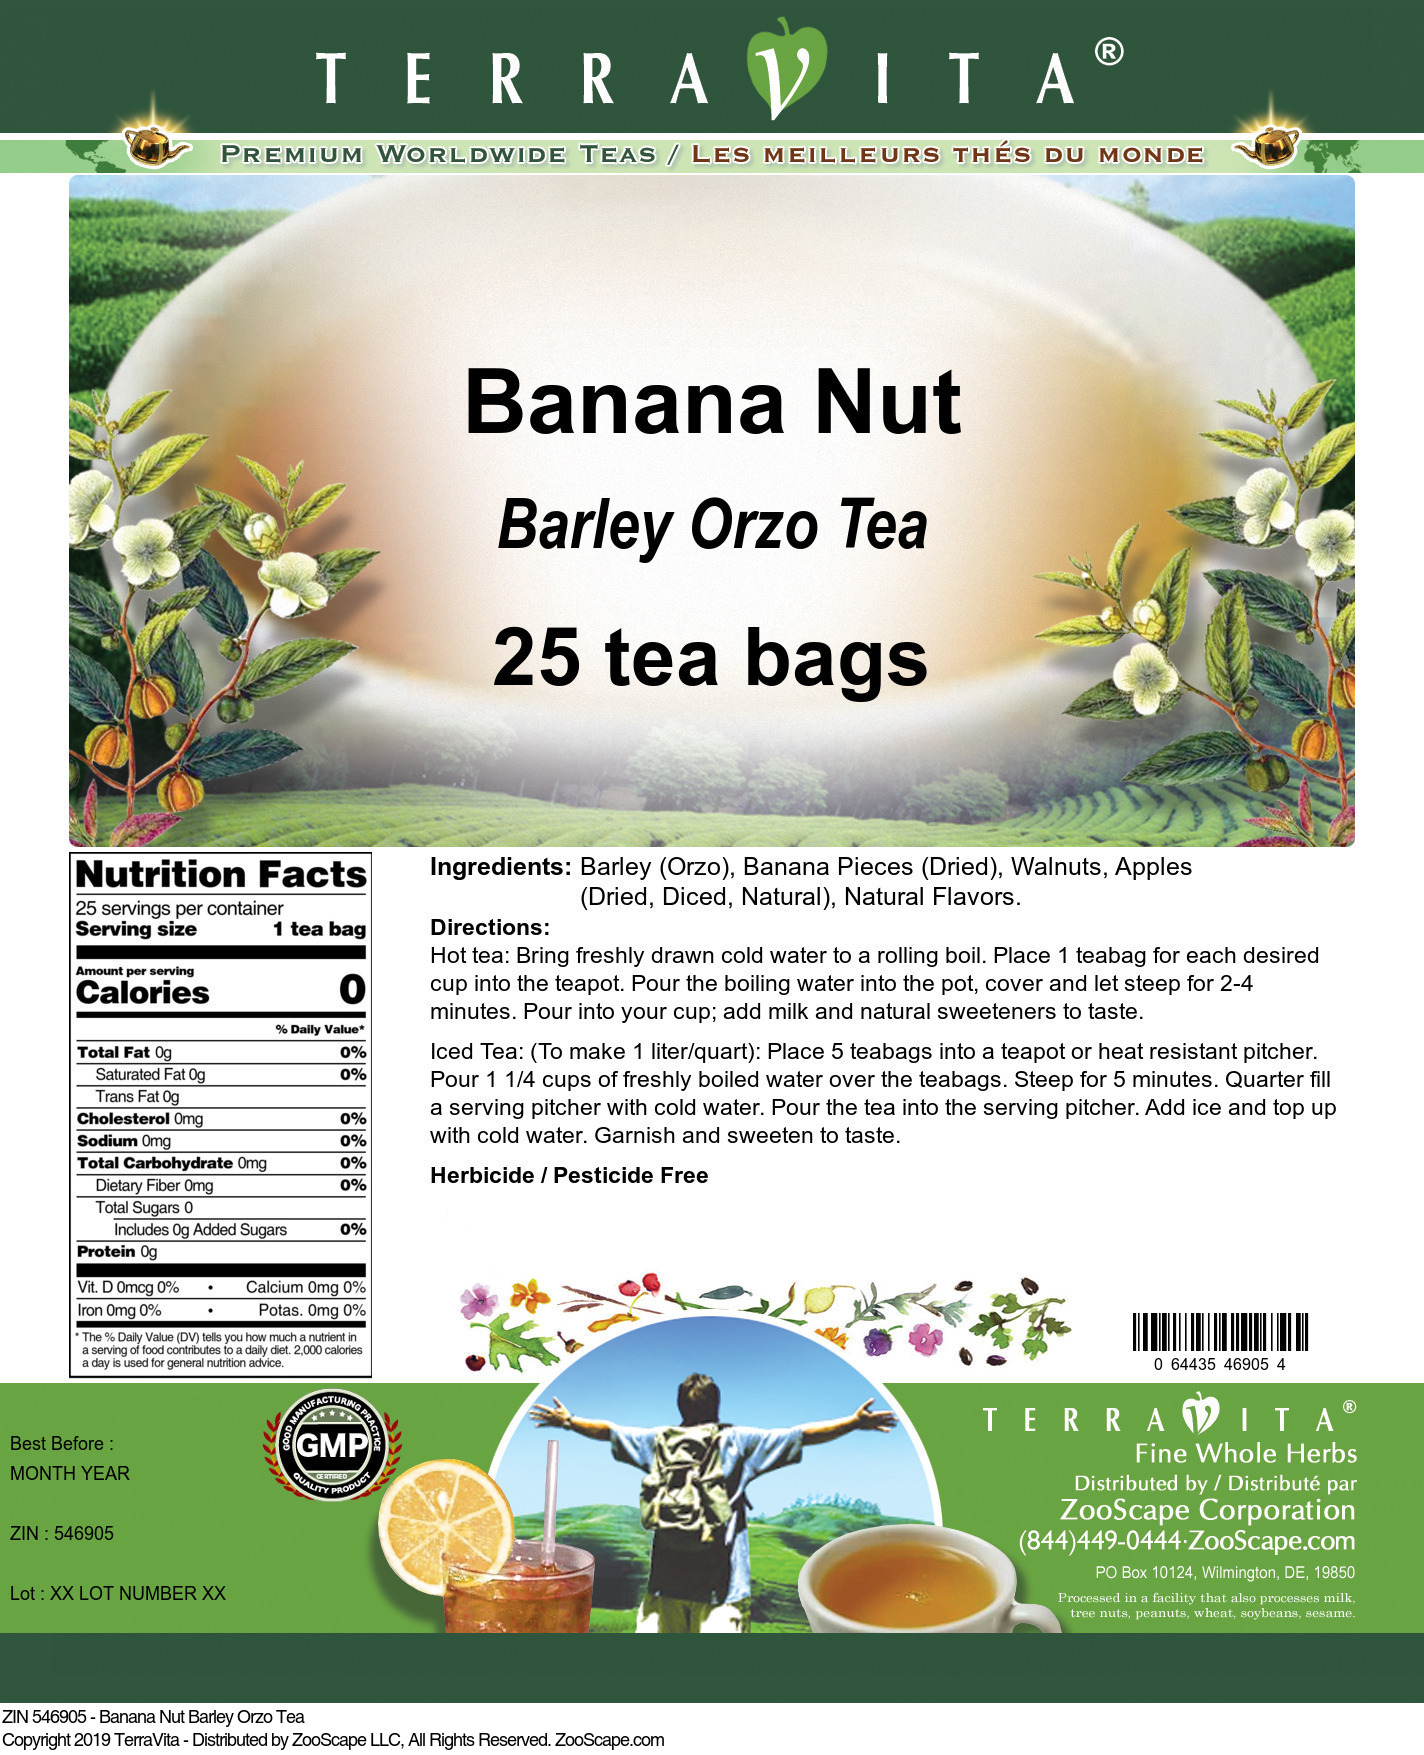 Banana Nut Barley Orzo Tea